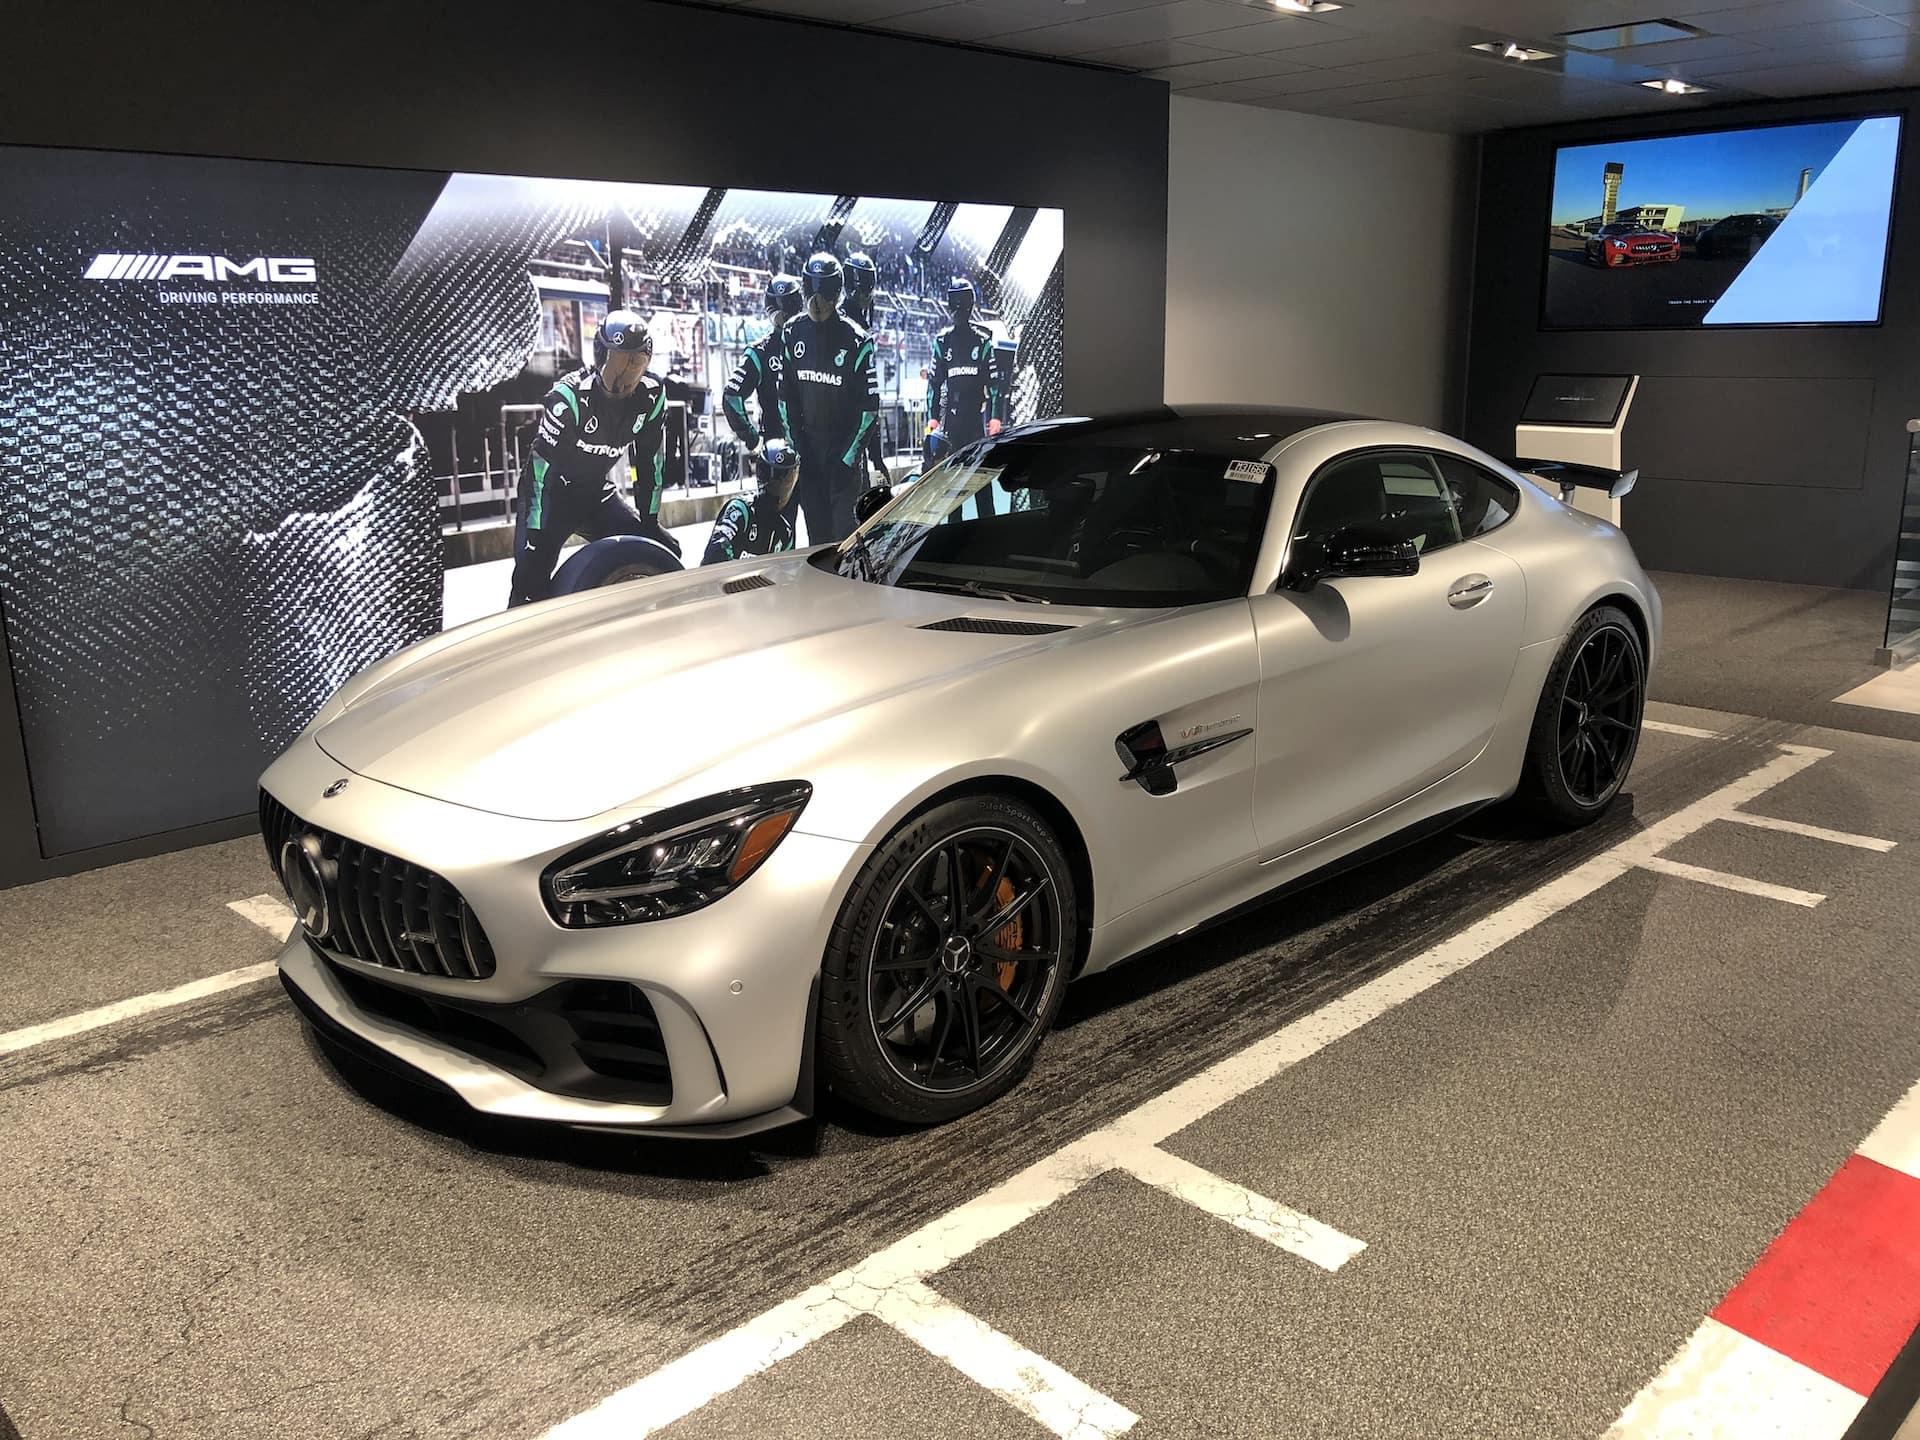 Mercedes Vehicle AMG®